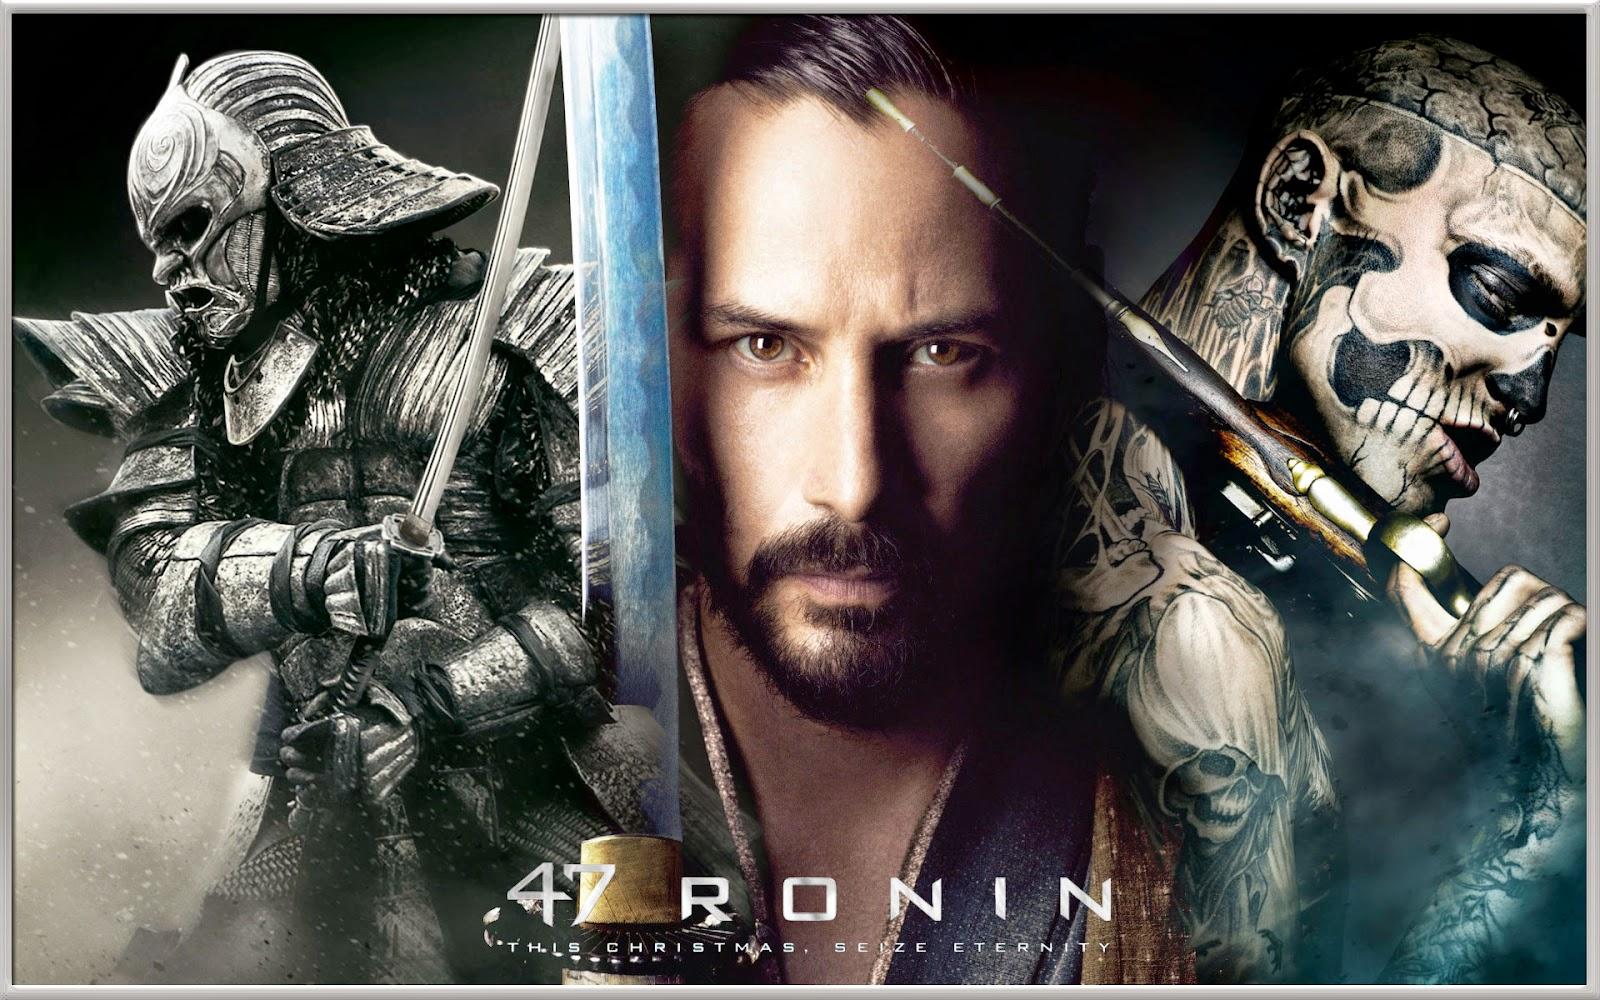 Heroic Fantasy Writers: Movie Review: 47 Ronin